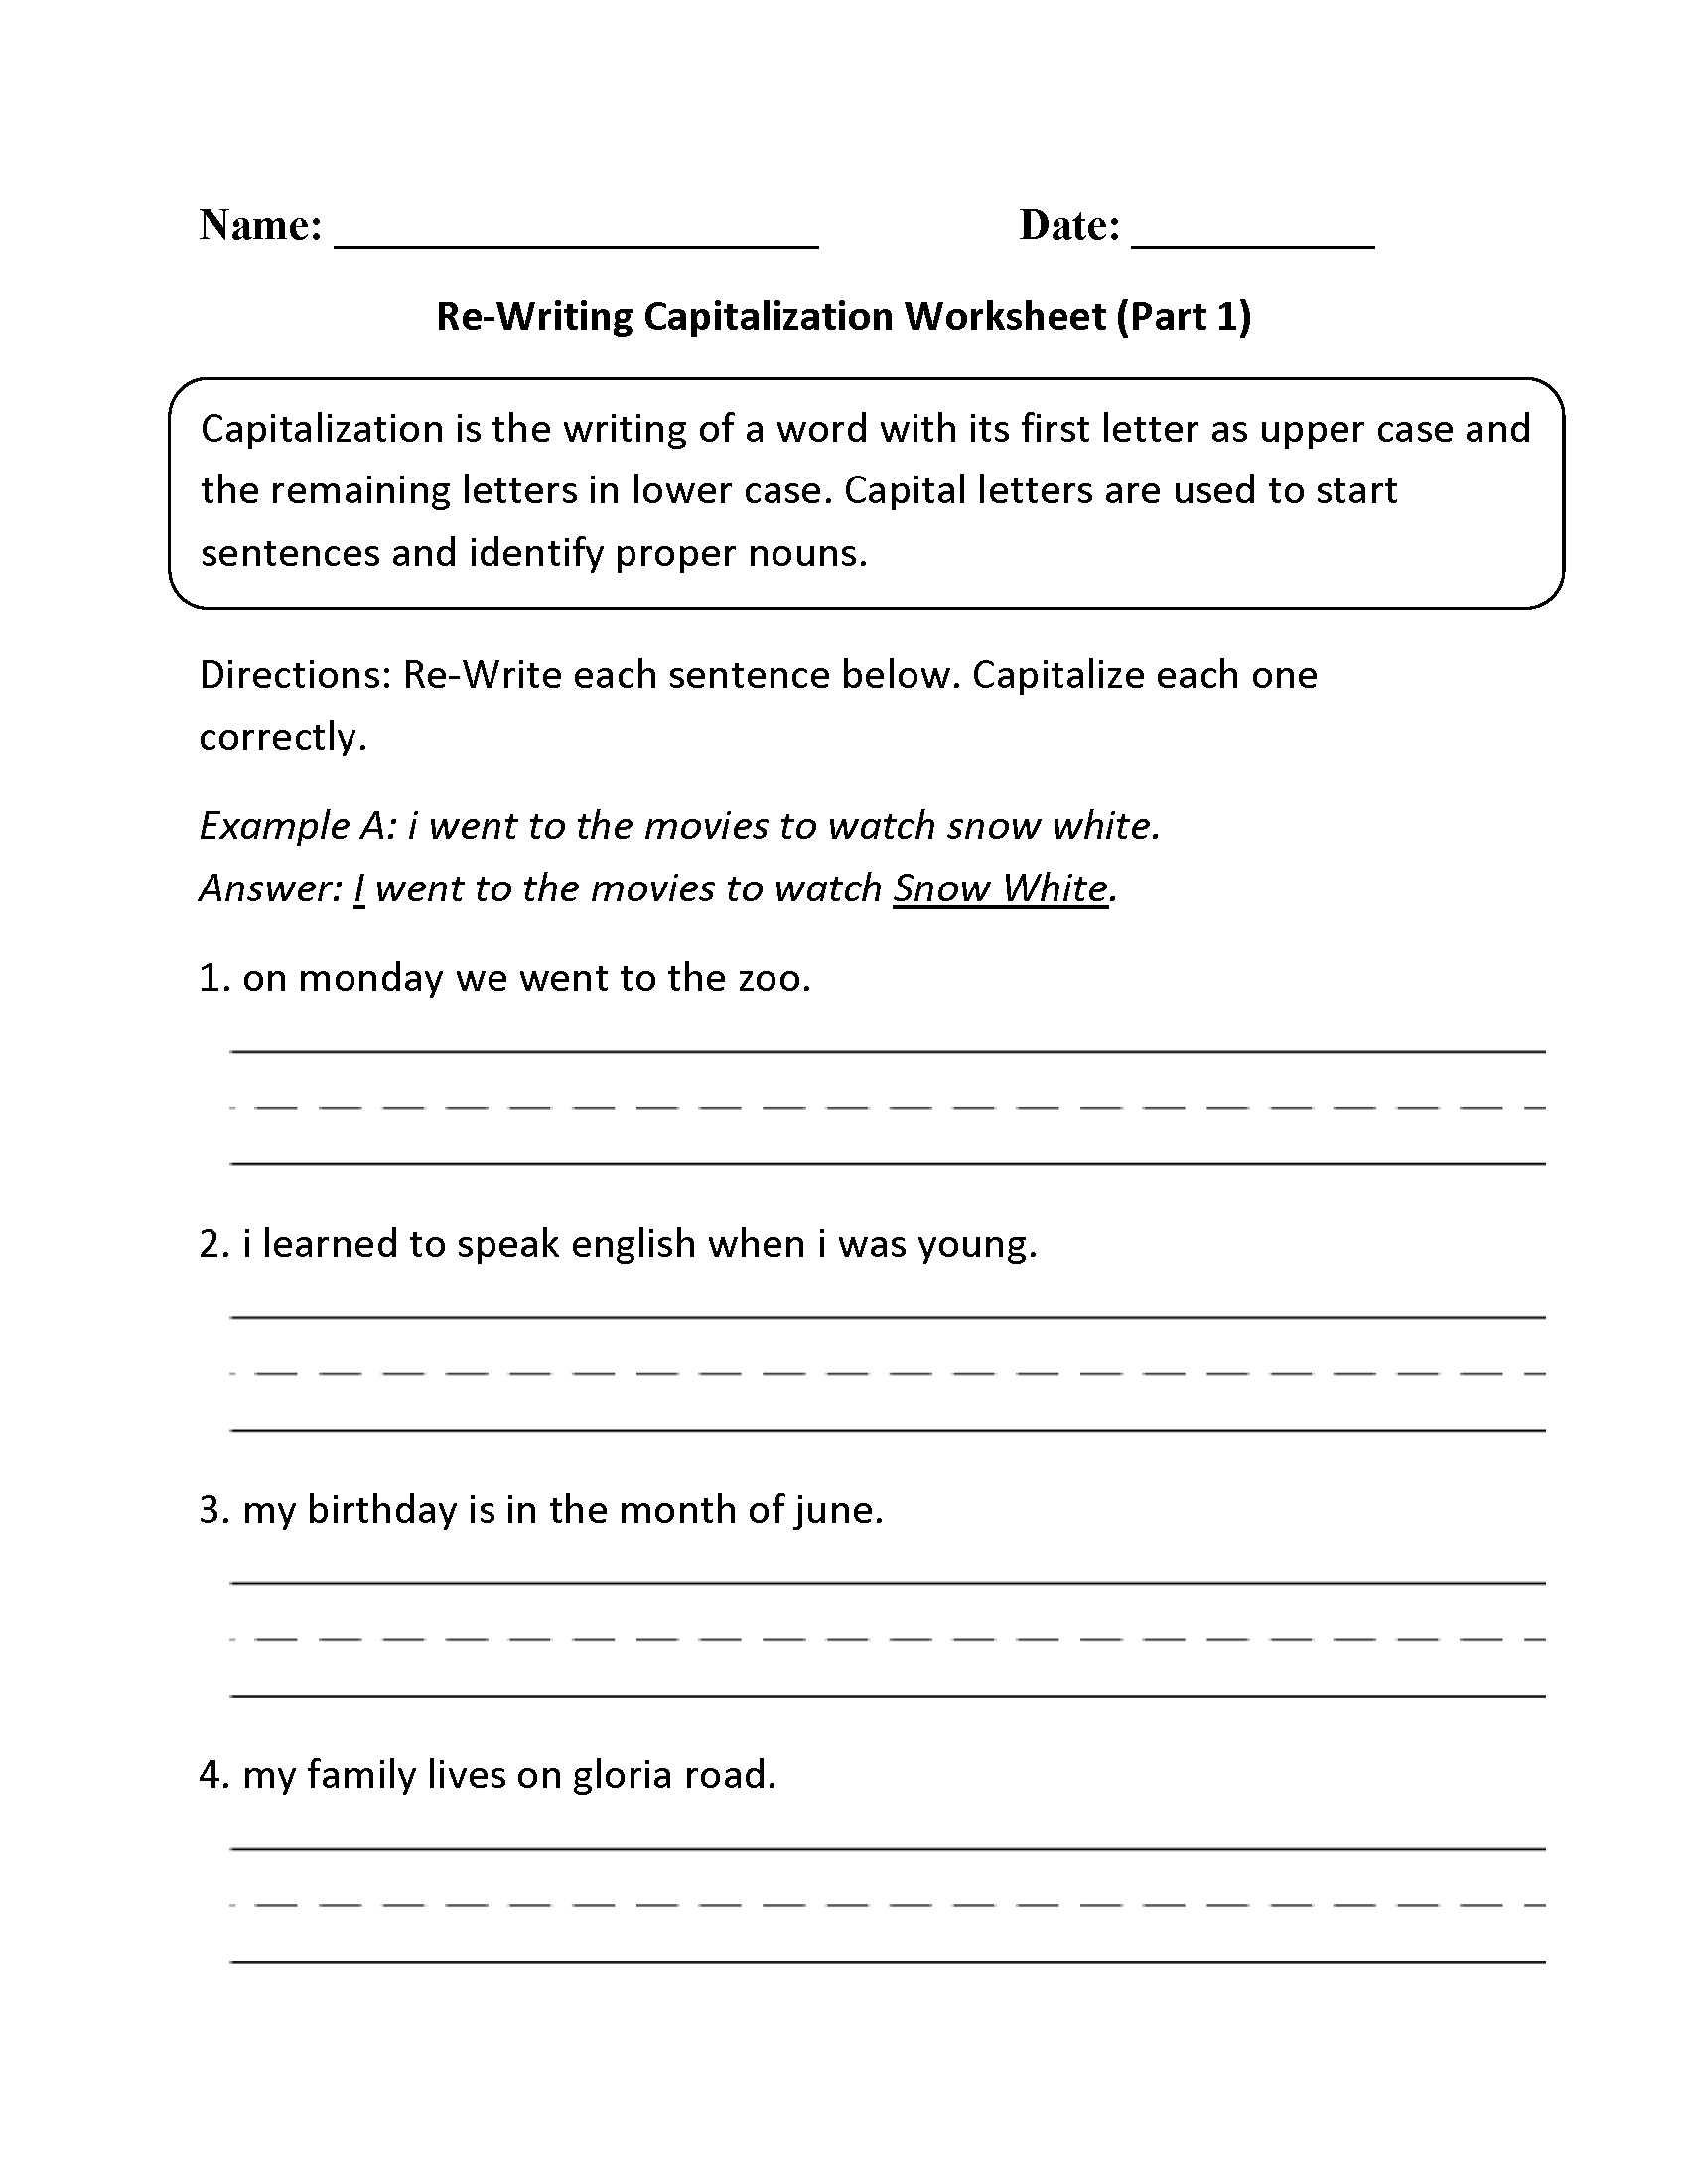 Writing Sentences Worksheets for 1st Grade Along with 1st Grade Sentence Writing Worksheets Worksheets for All